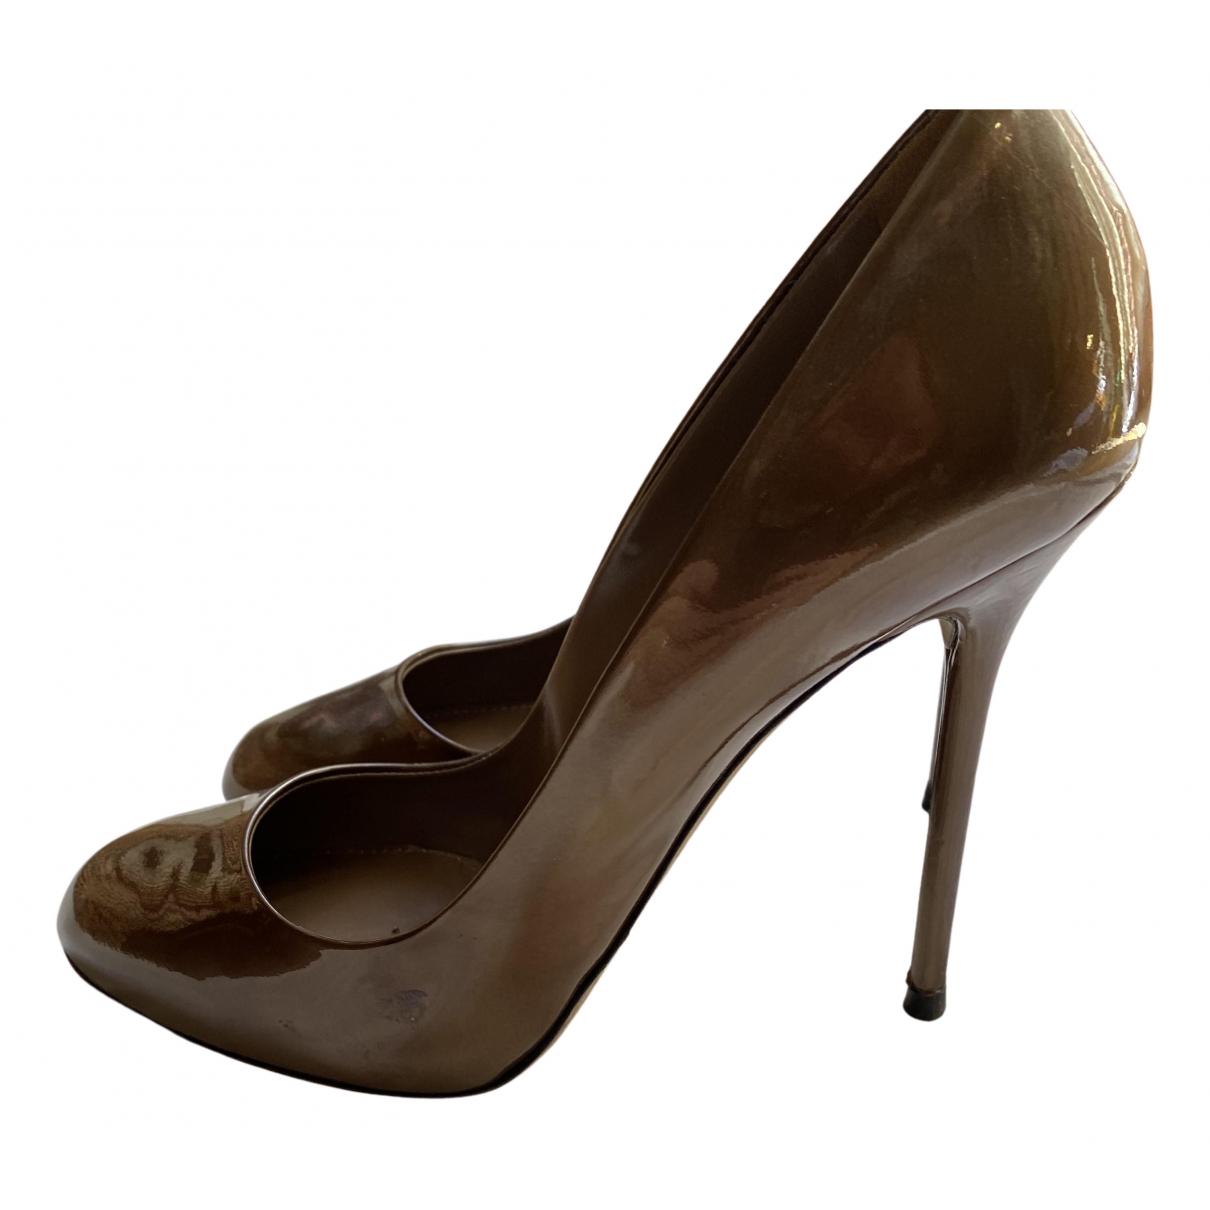 Sergio Rossi - Escarpins   pour femme en cuir verni - metallise